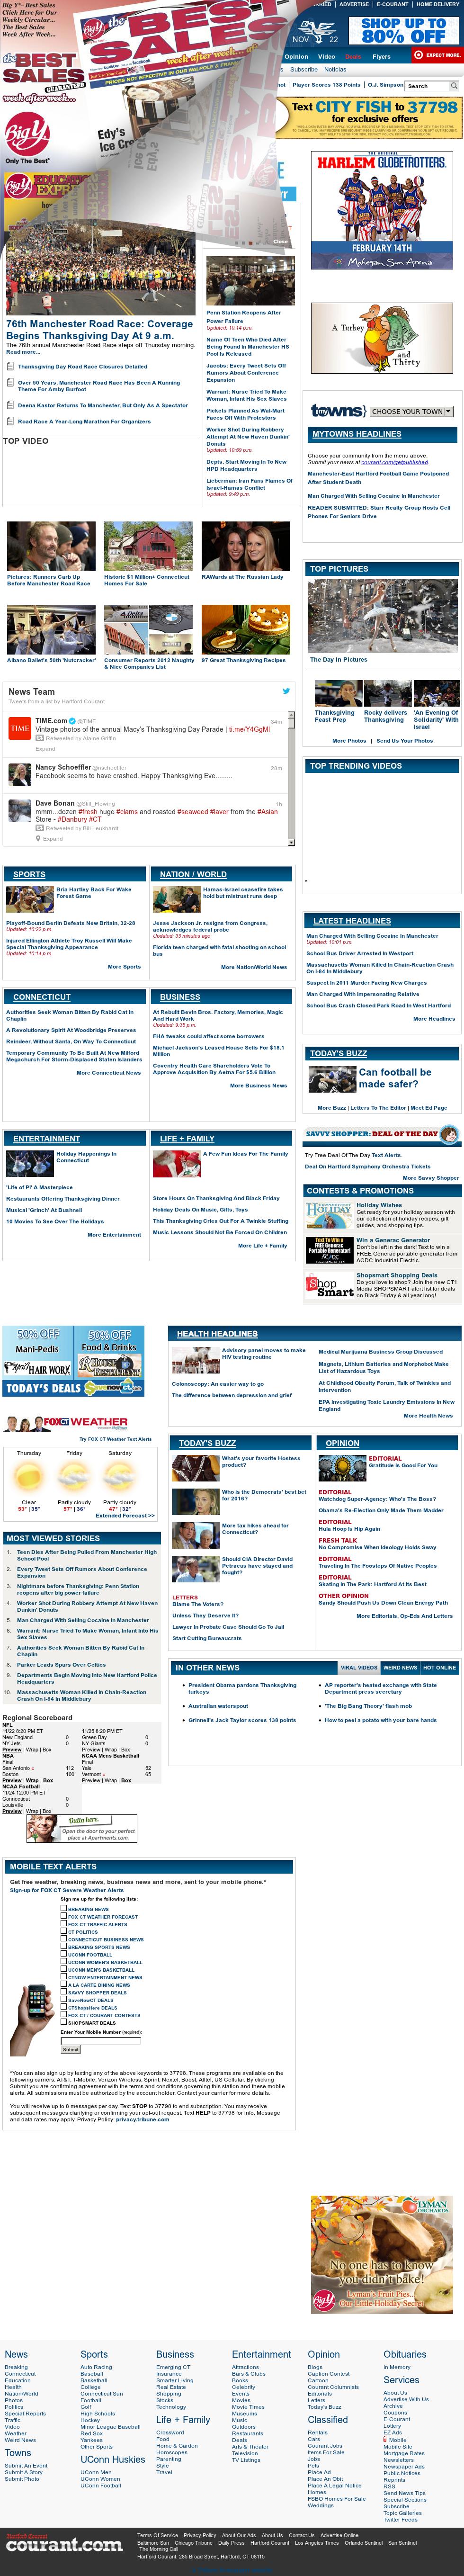 Hartford Courant at Thursday Nov. 22, 2012, 5:14 a.m. UTC